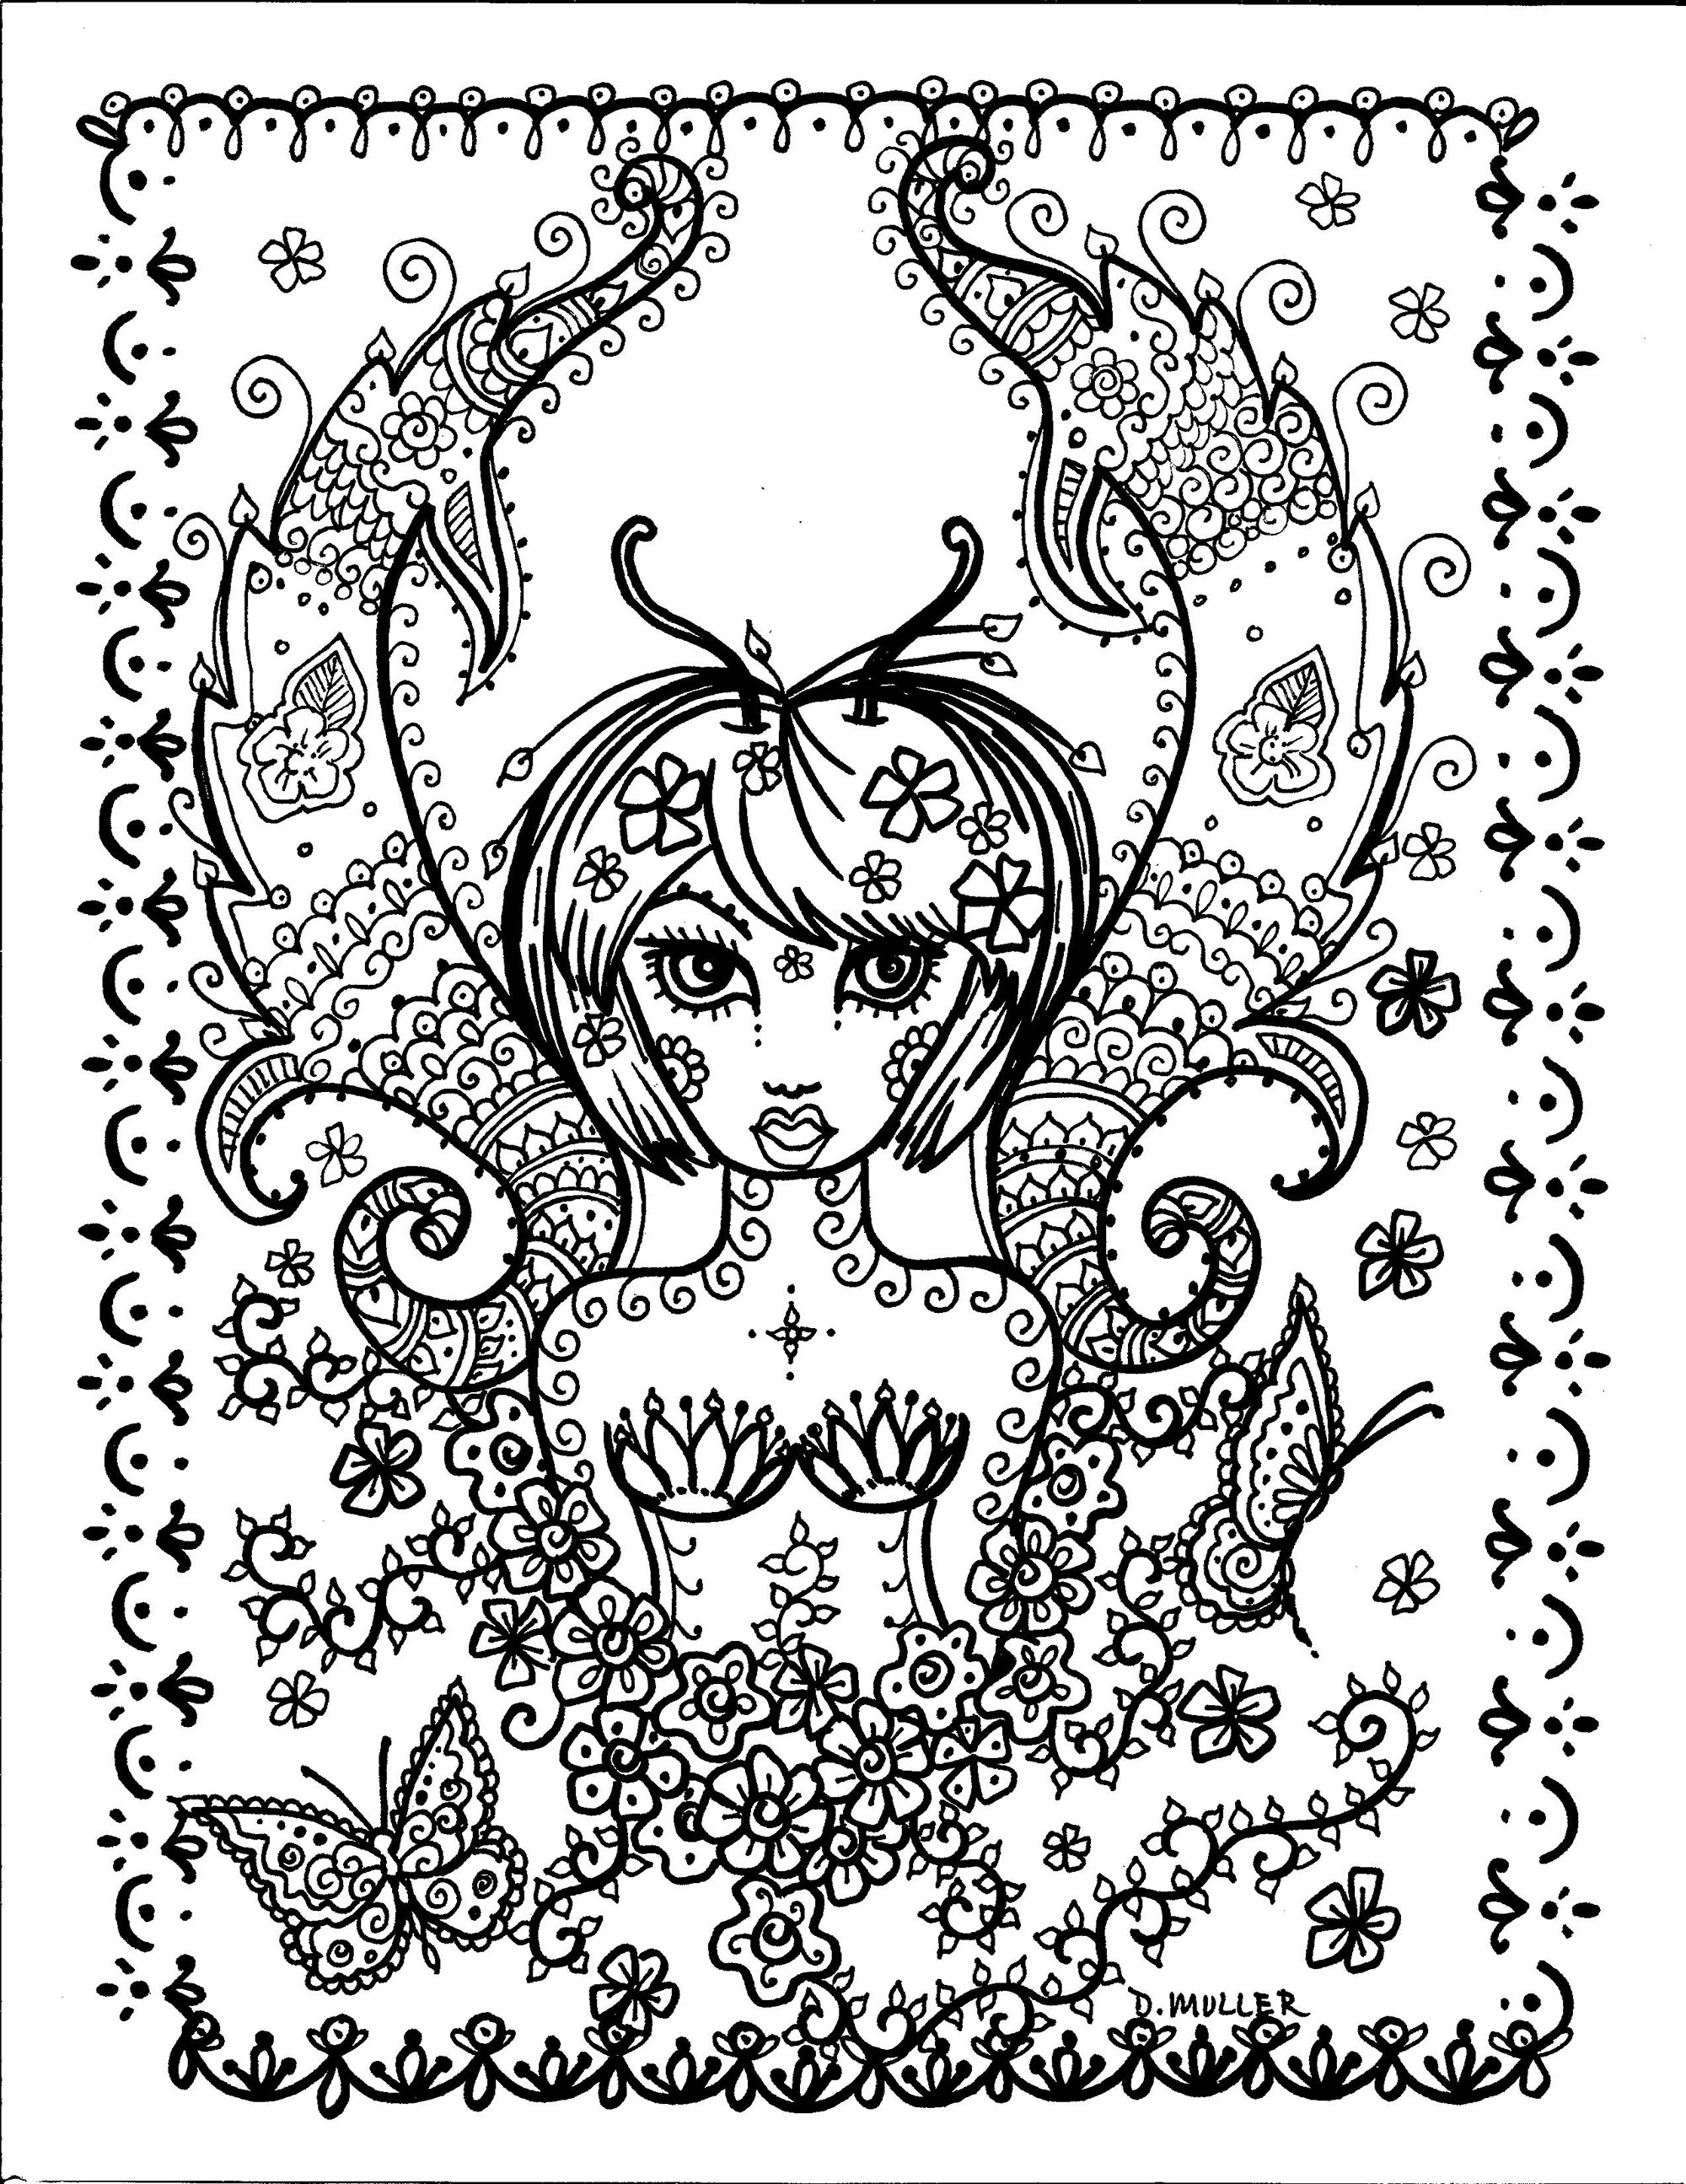 La fille papillonA partir de la galerie : Anti StressArtiste : Deborah Muller